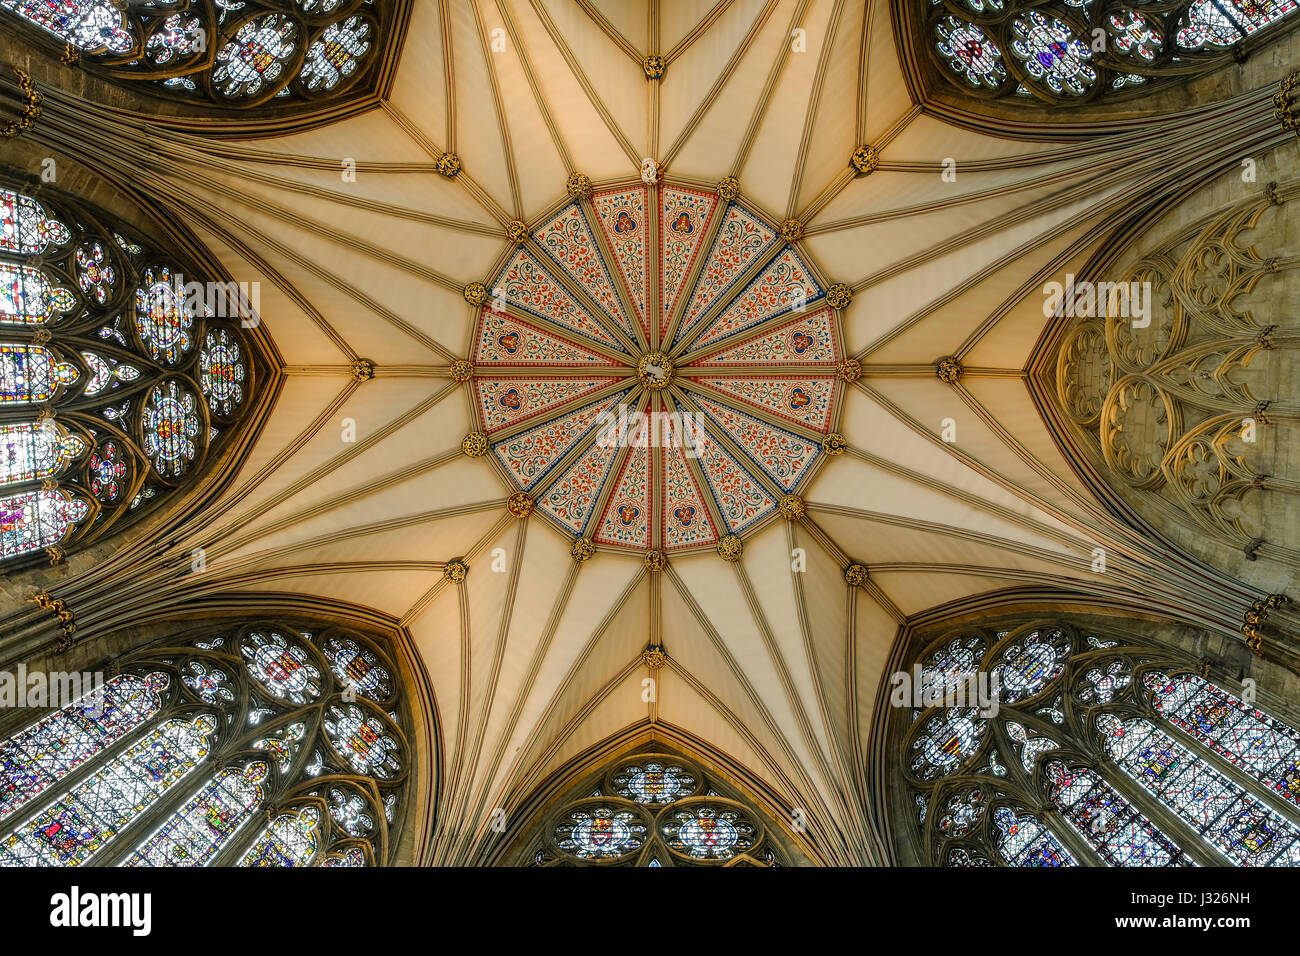 The Chapter House Ceiling inside York Minster - Stock Image